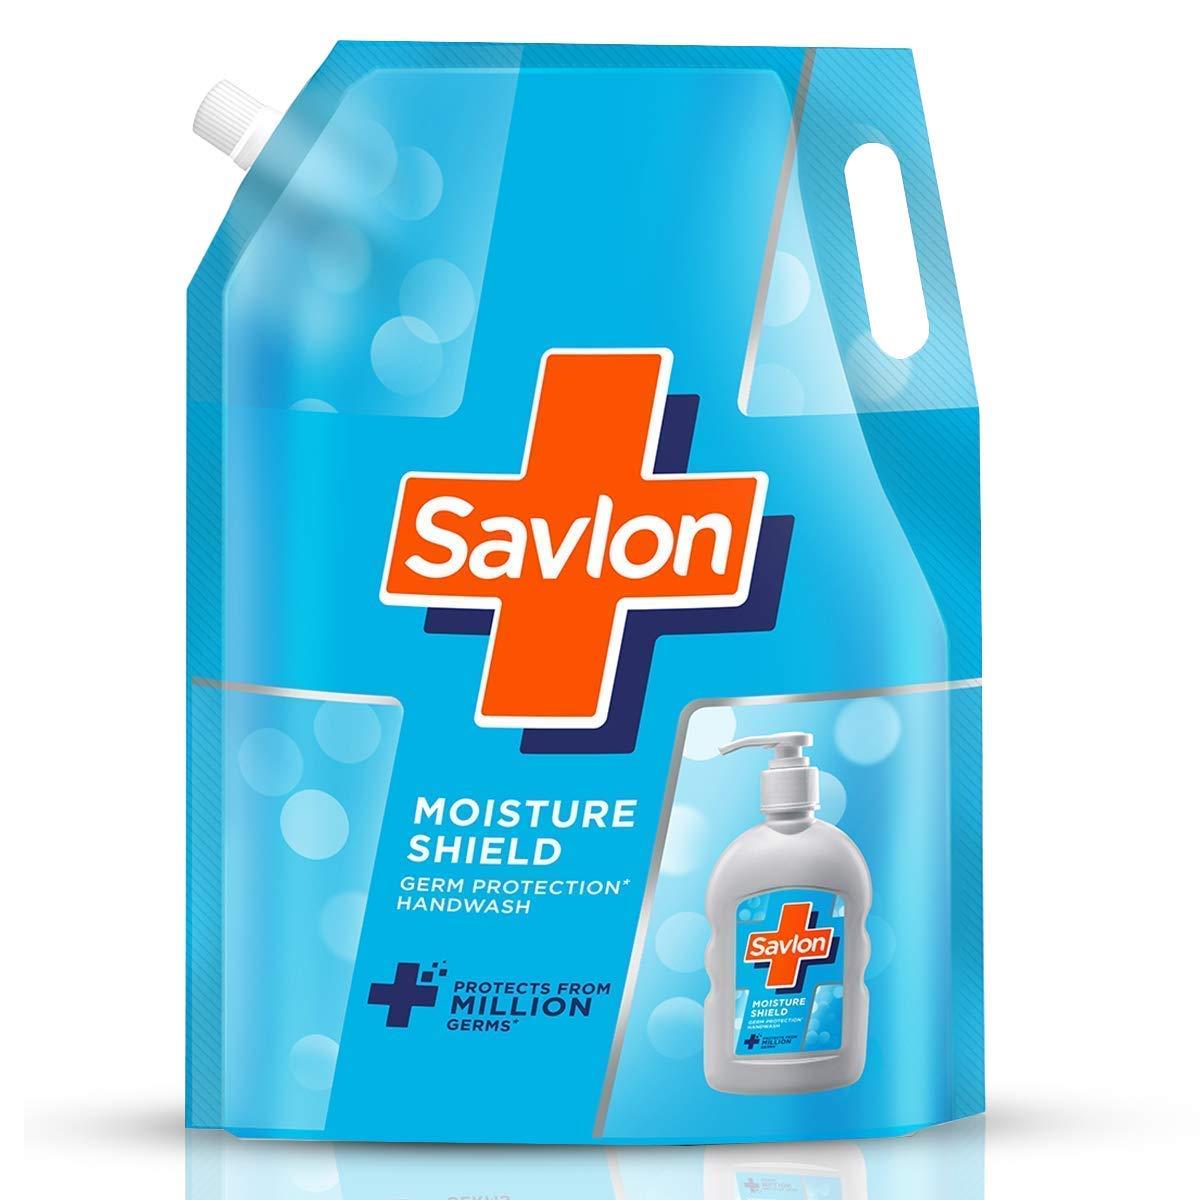 Savlon Moisture Shield Germ Protection Liquid Handwash Refill Pouch, 1500ml